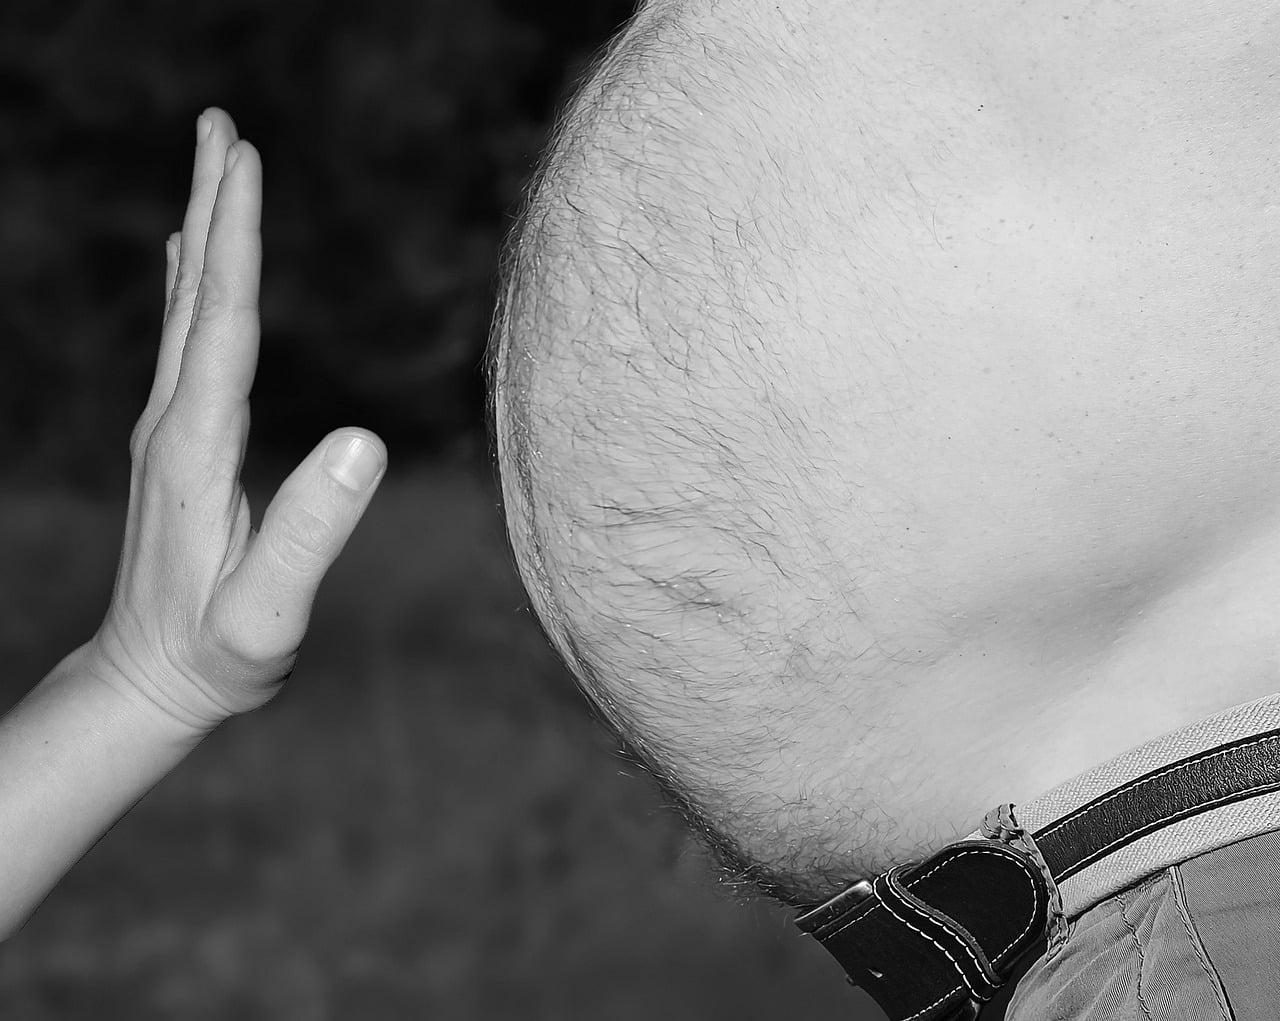 perte de poids de lomoplate